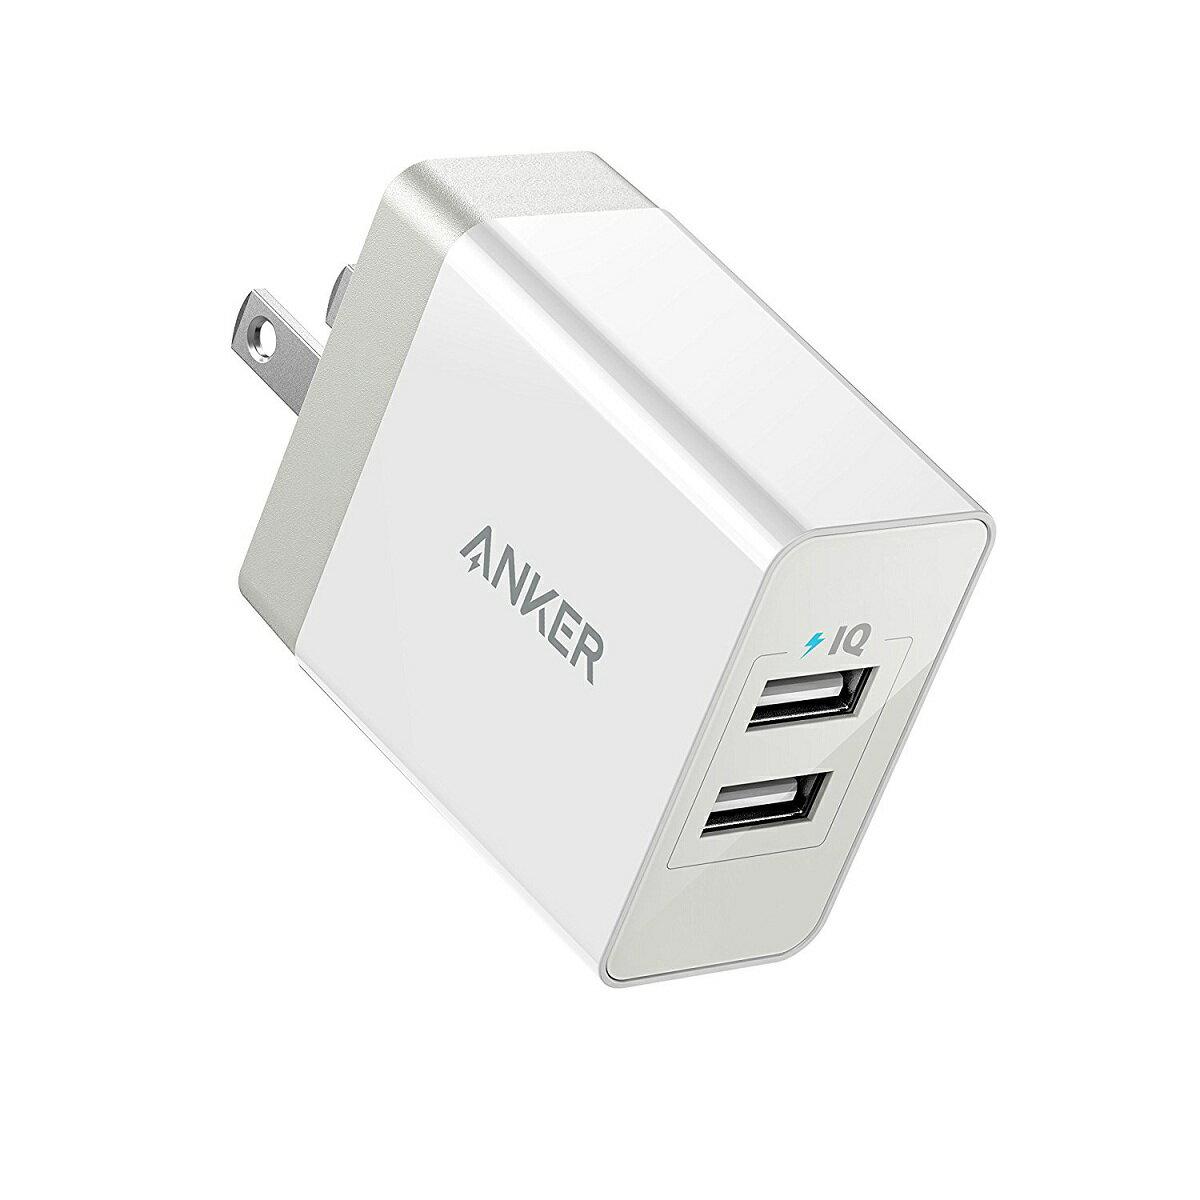 Anker PowerPort 2 Eco (12W 2ポート USB急速充電器) iPhone / iPad / MacBook / Android 各種対応【折り畳み式プラグ / PowerIQ & VoltageBoost】